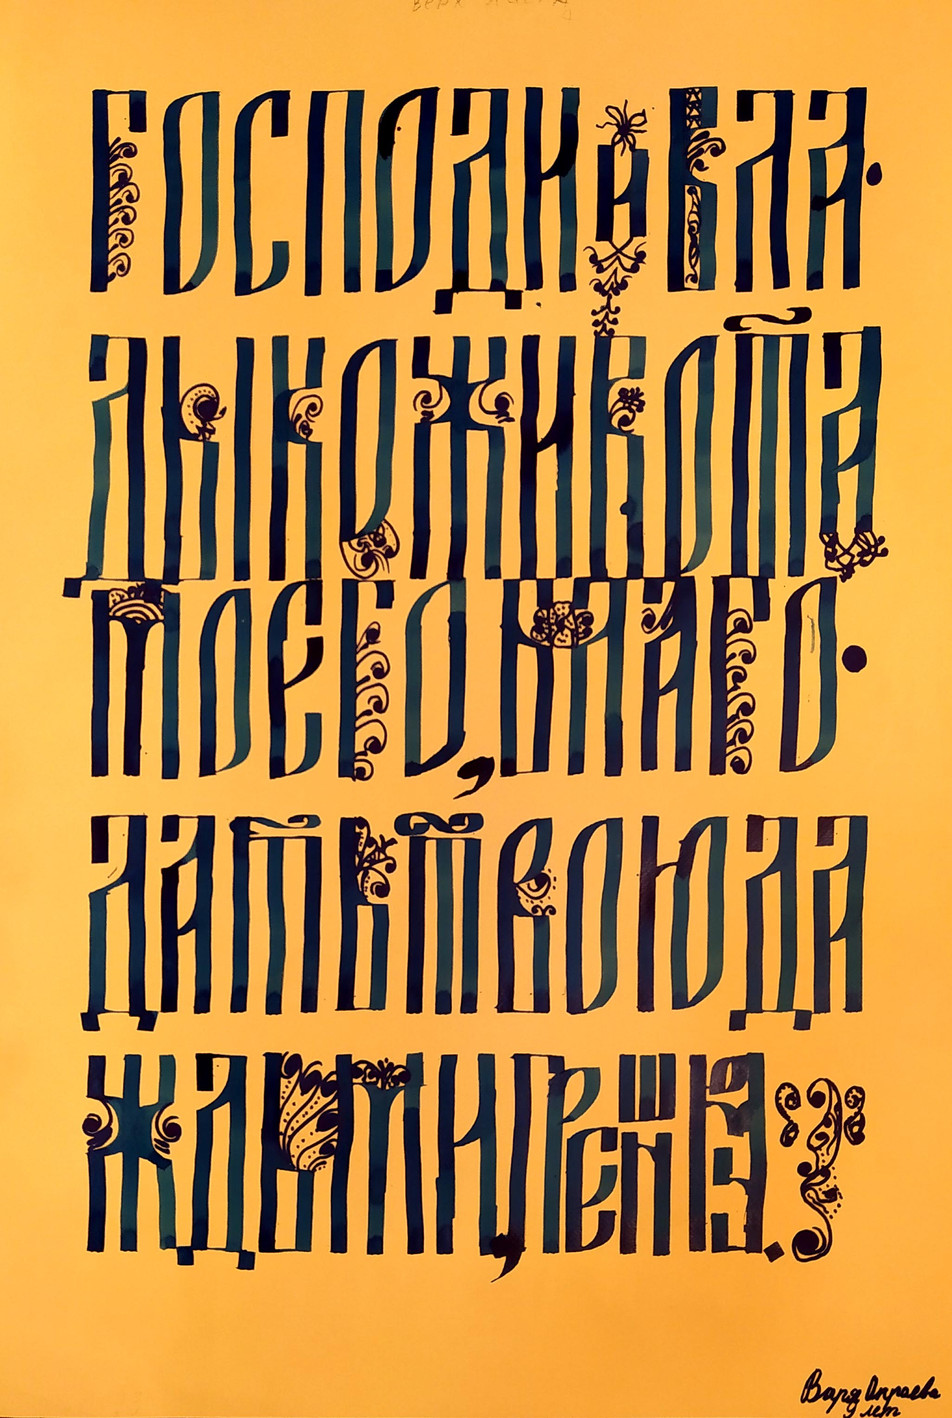 Okroeva Varvara_Moscow_Russia_vjaz_Gospo